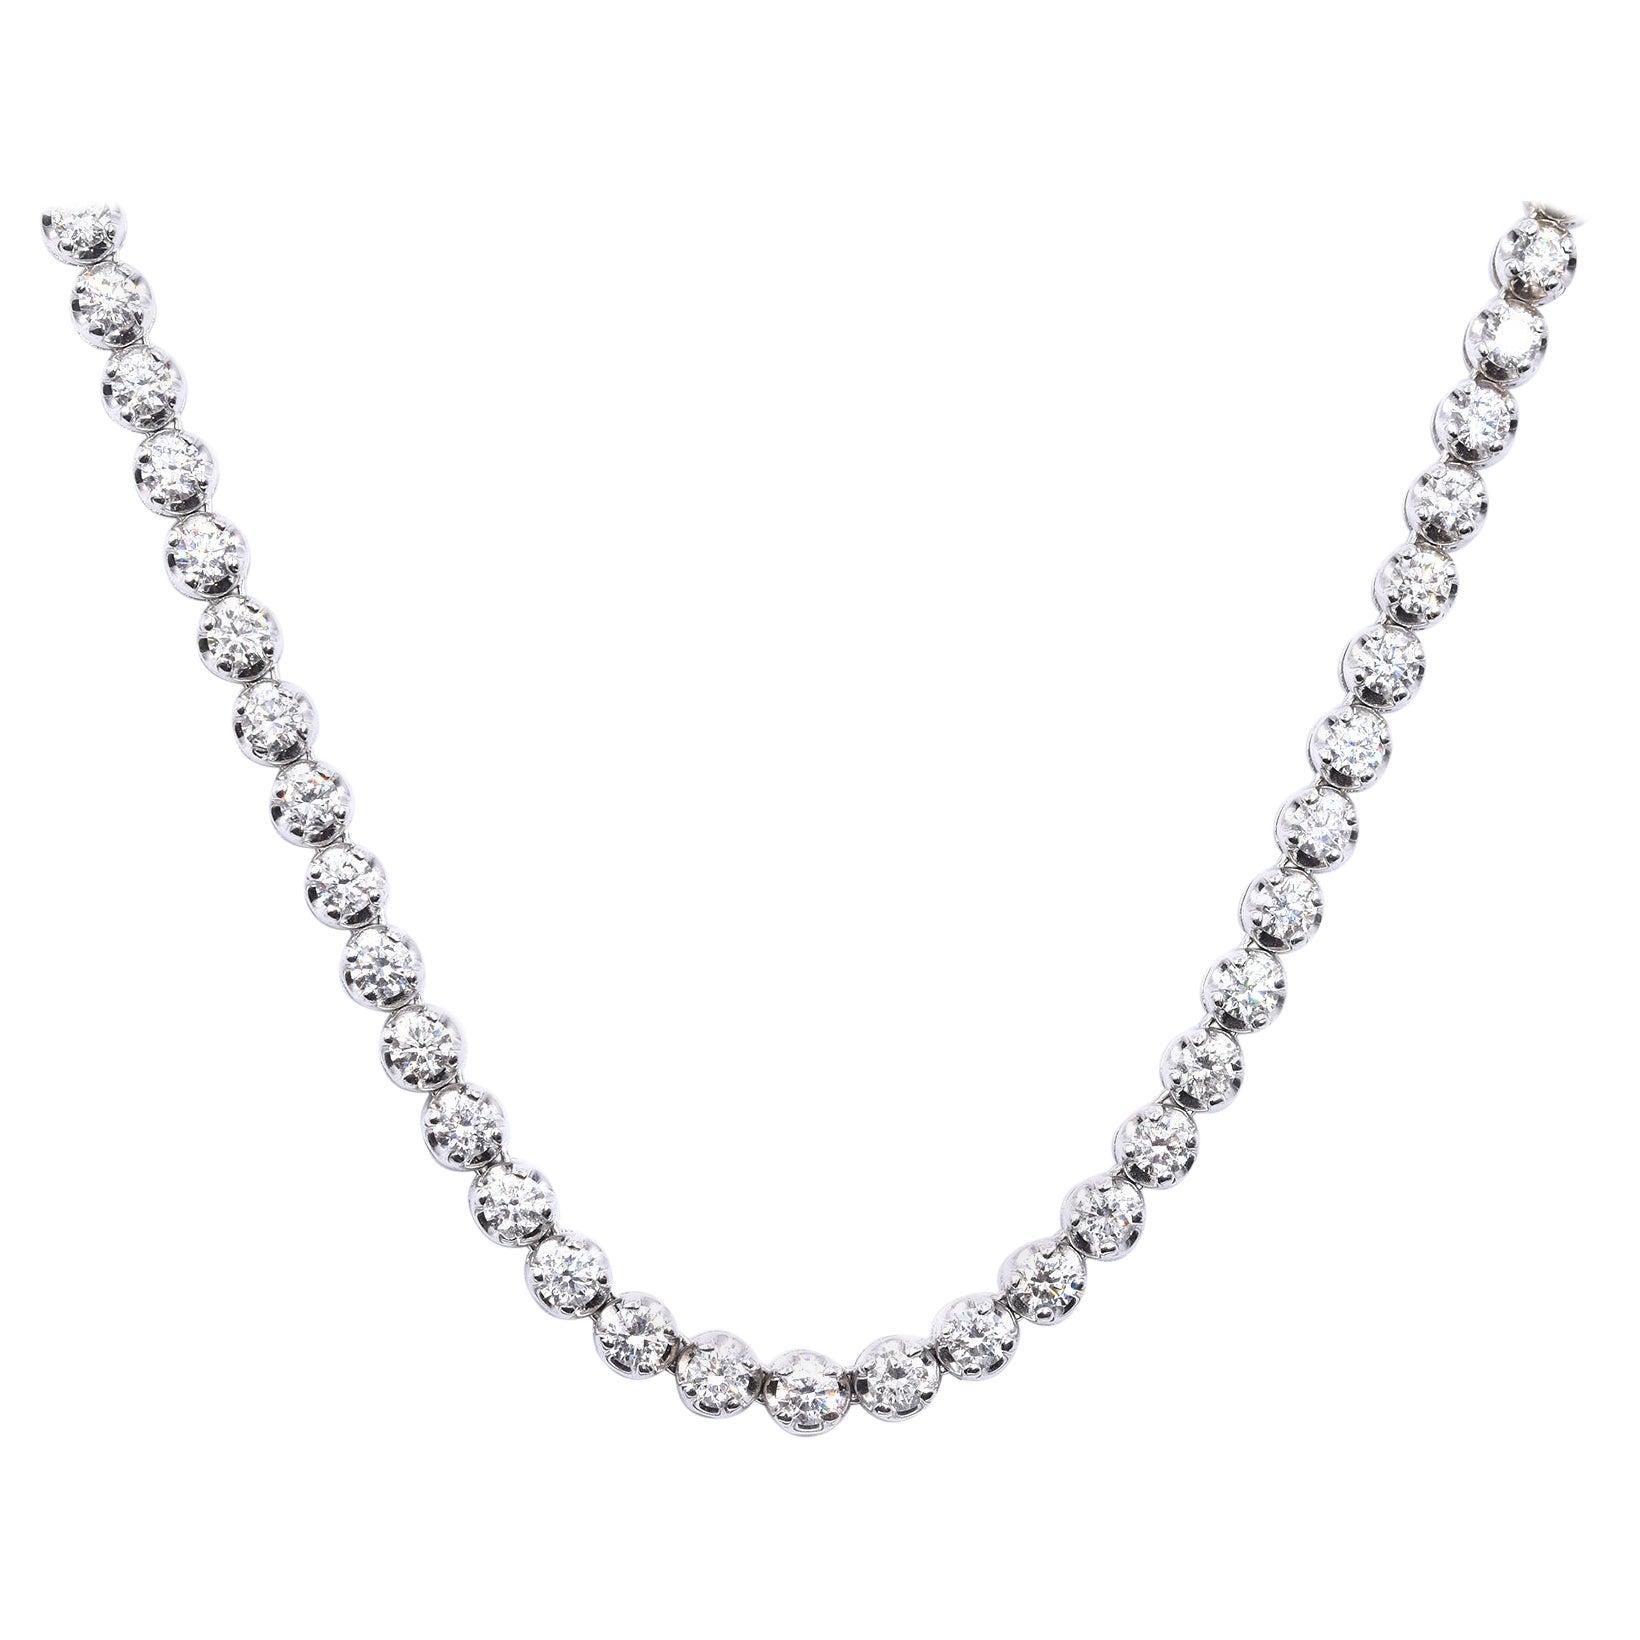 14 Karat White Gold Diamond Tennis Necklace